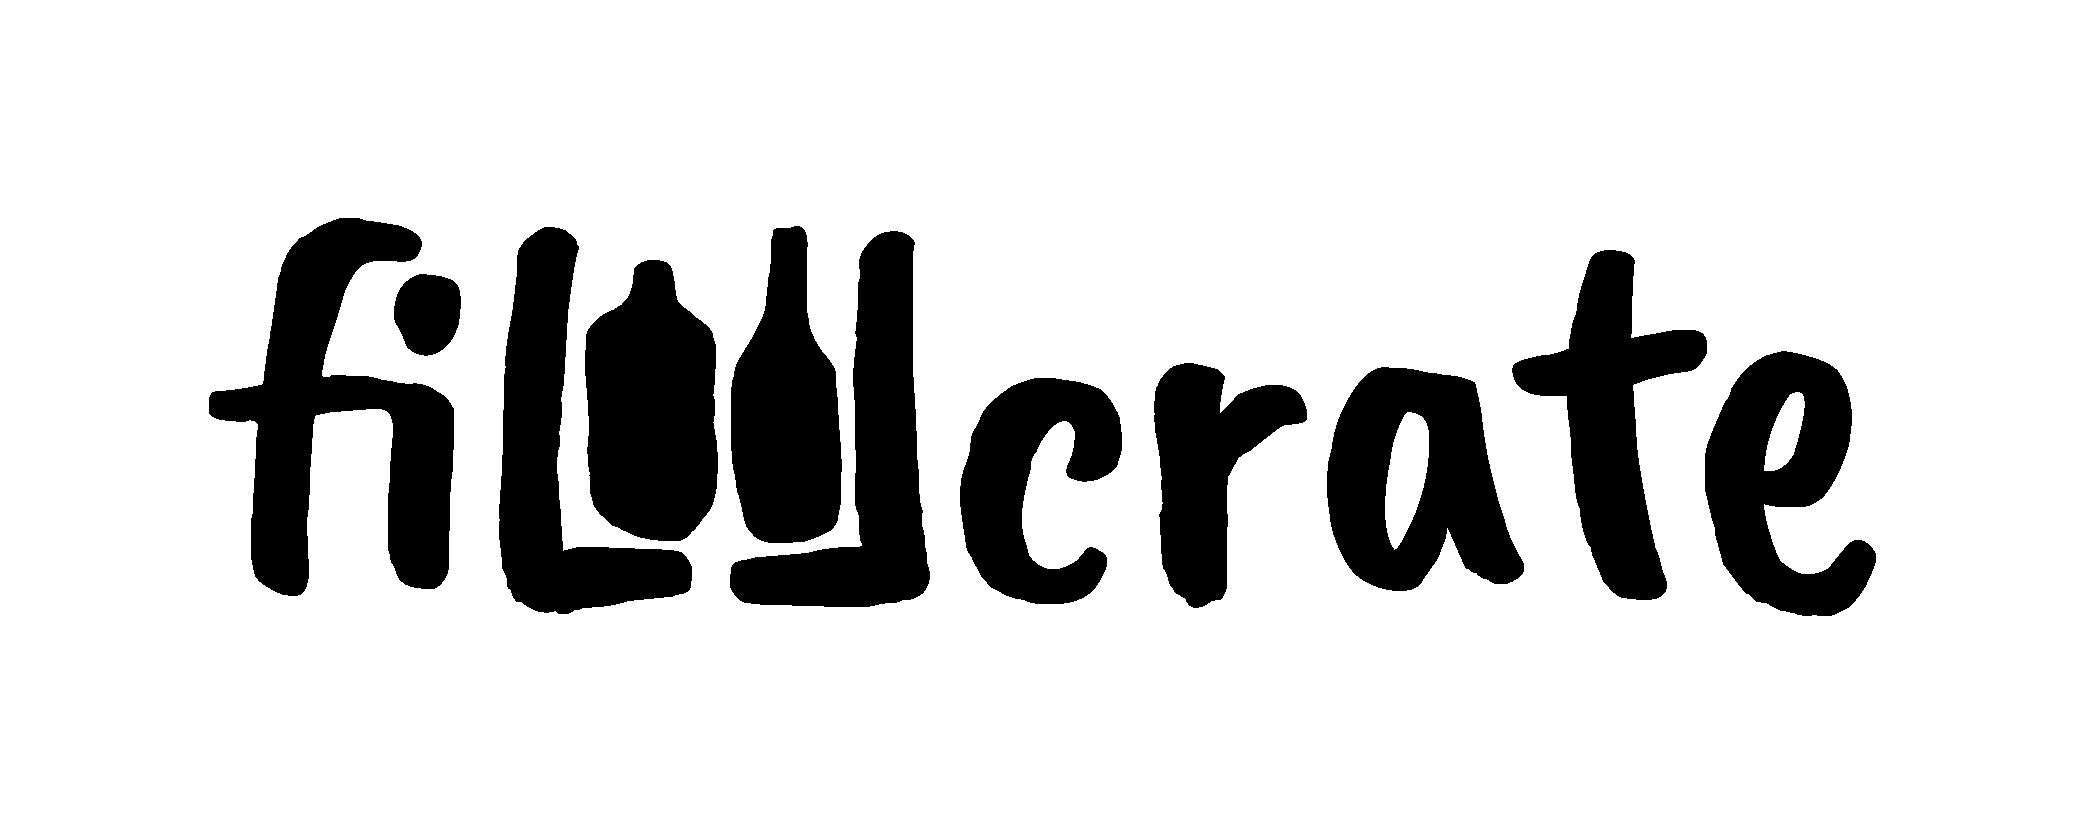 Design playful modern zero waste company logo